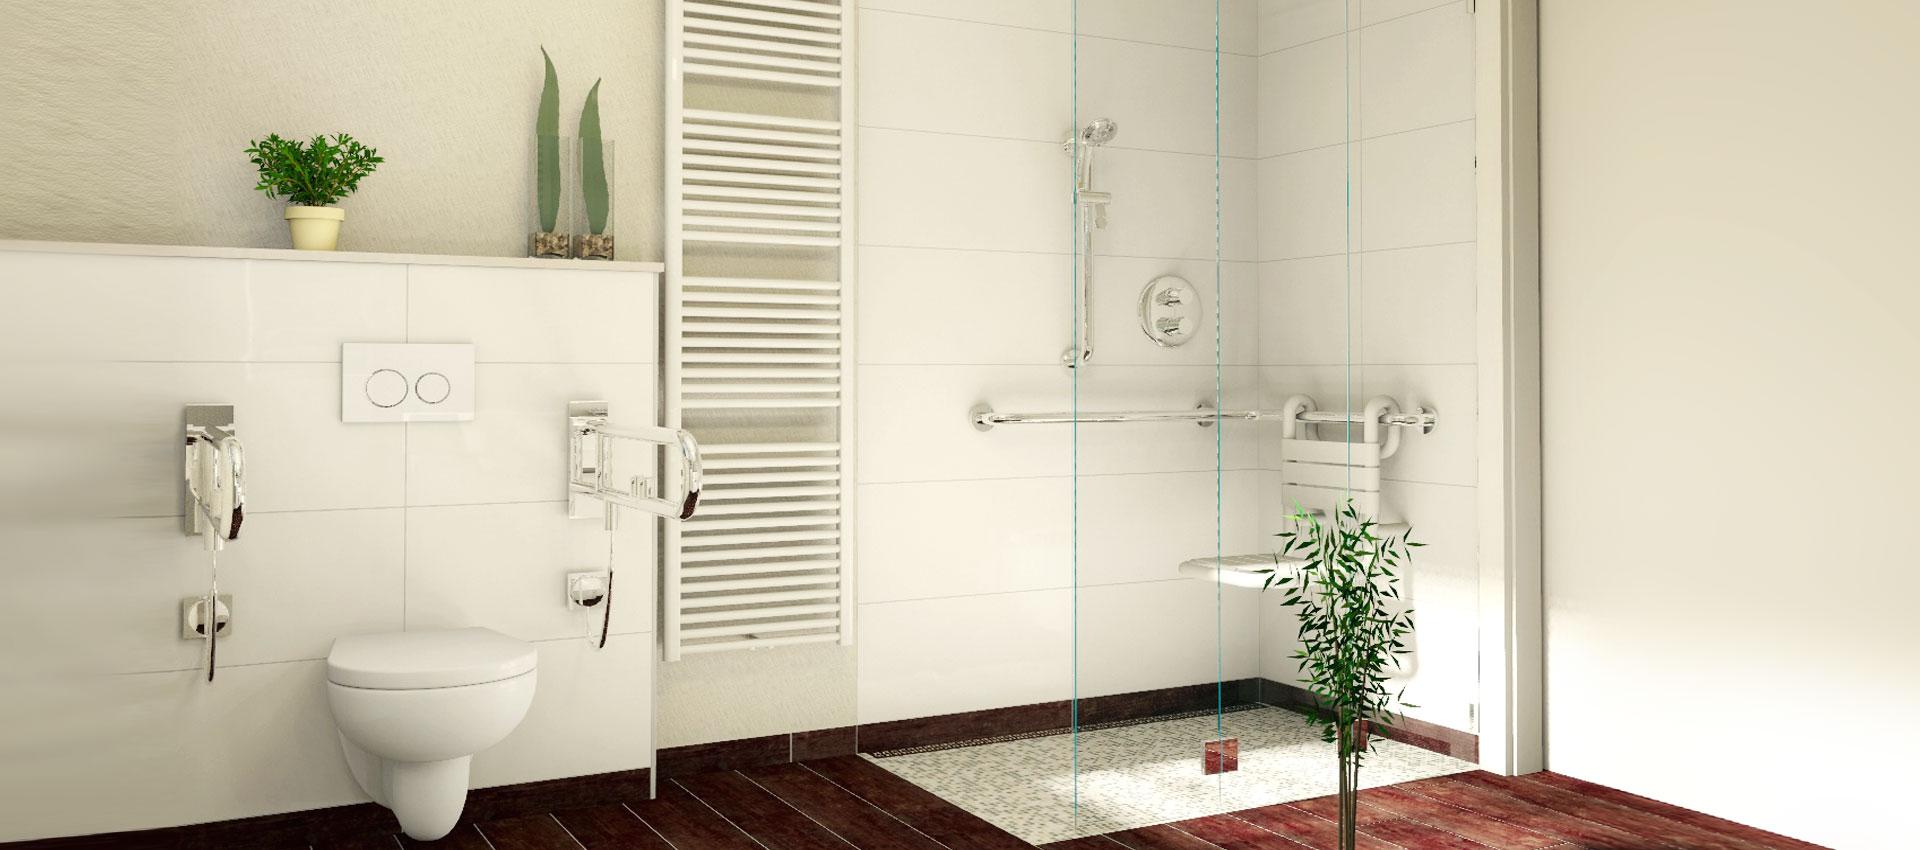 Duschwanne Barrierefrei duschwanne barrierefrei hausdesign pro